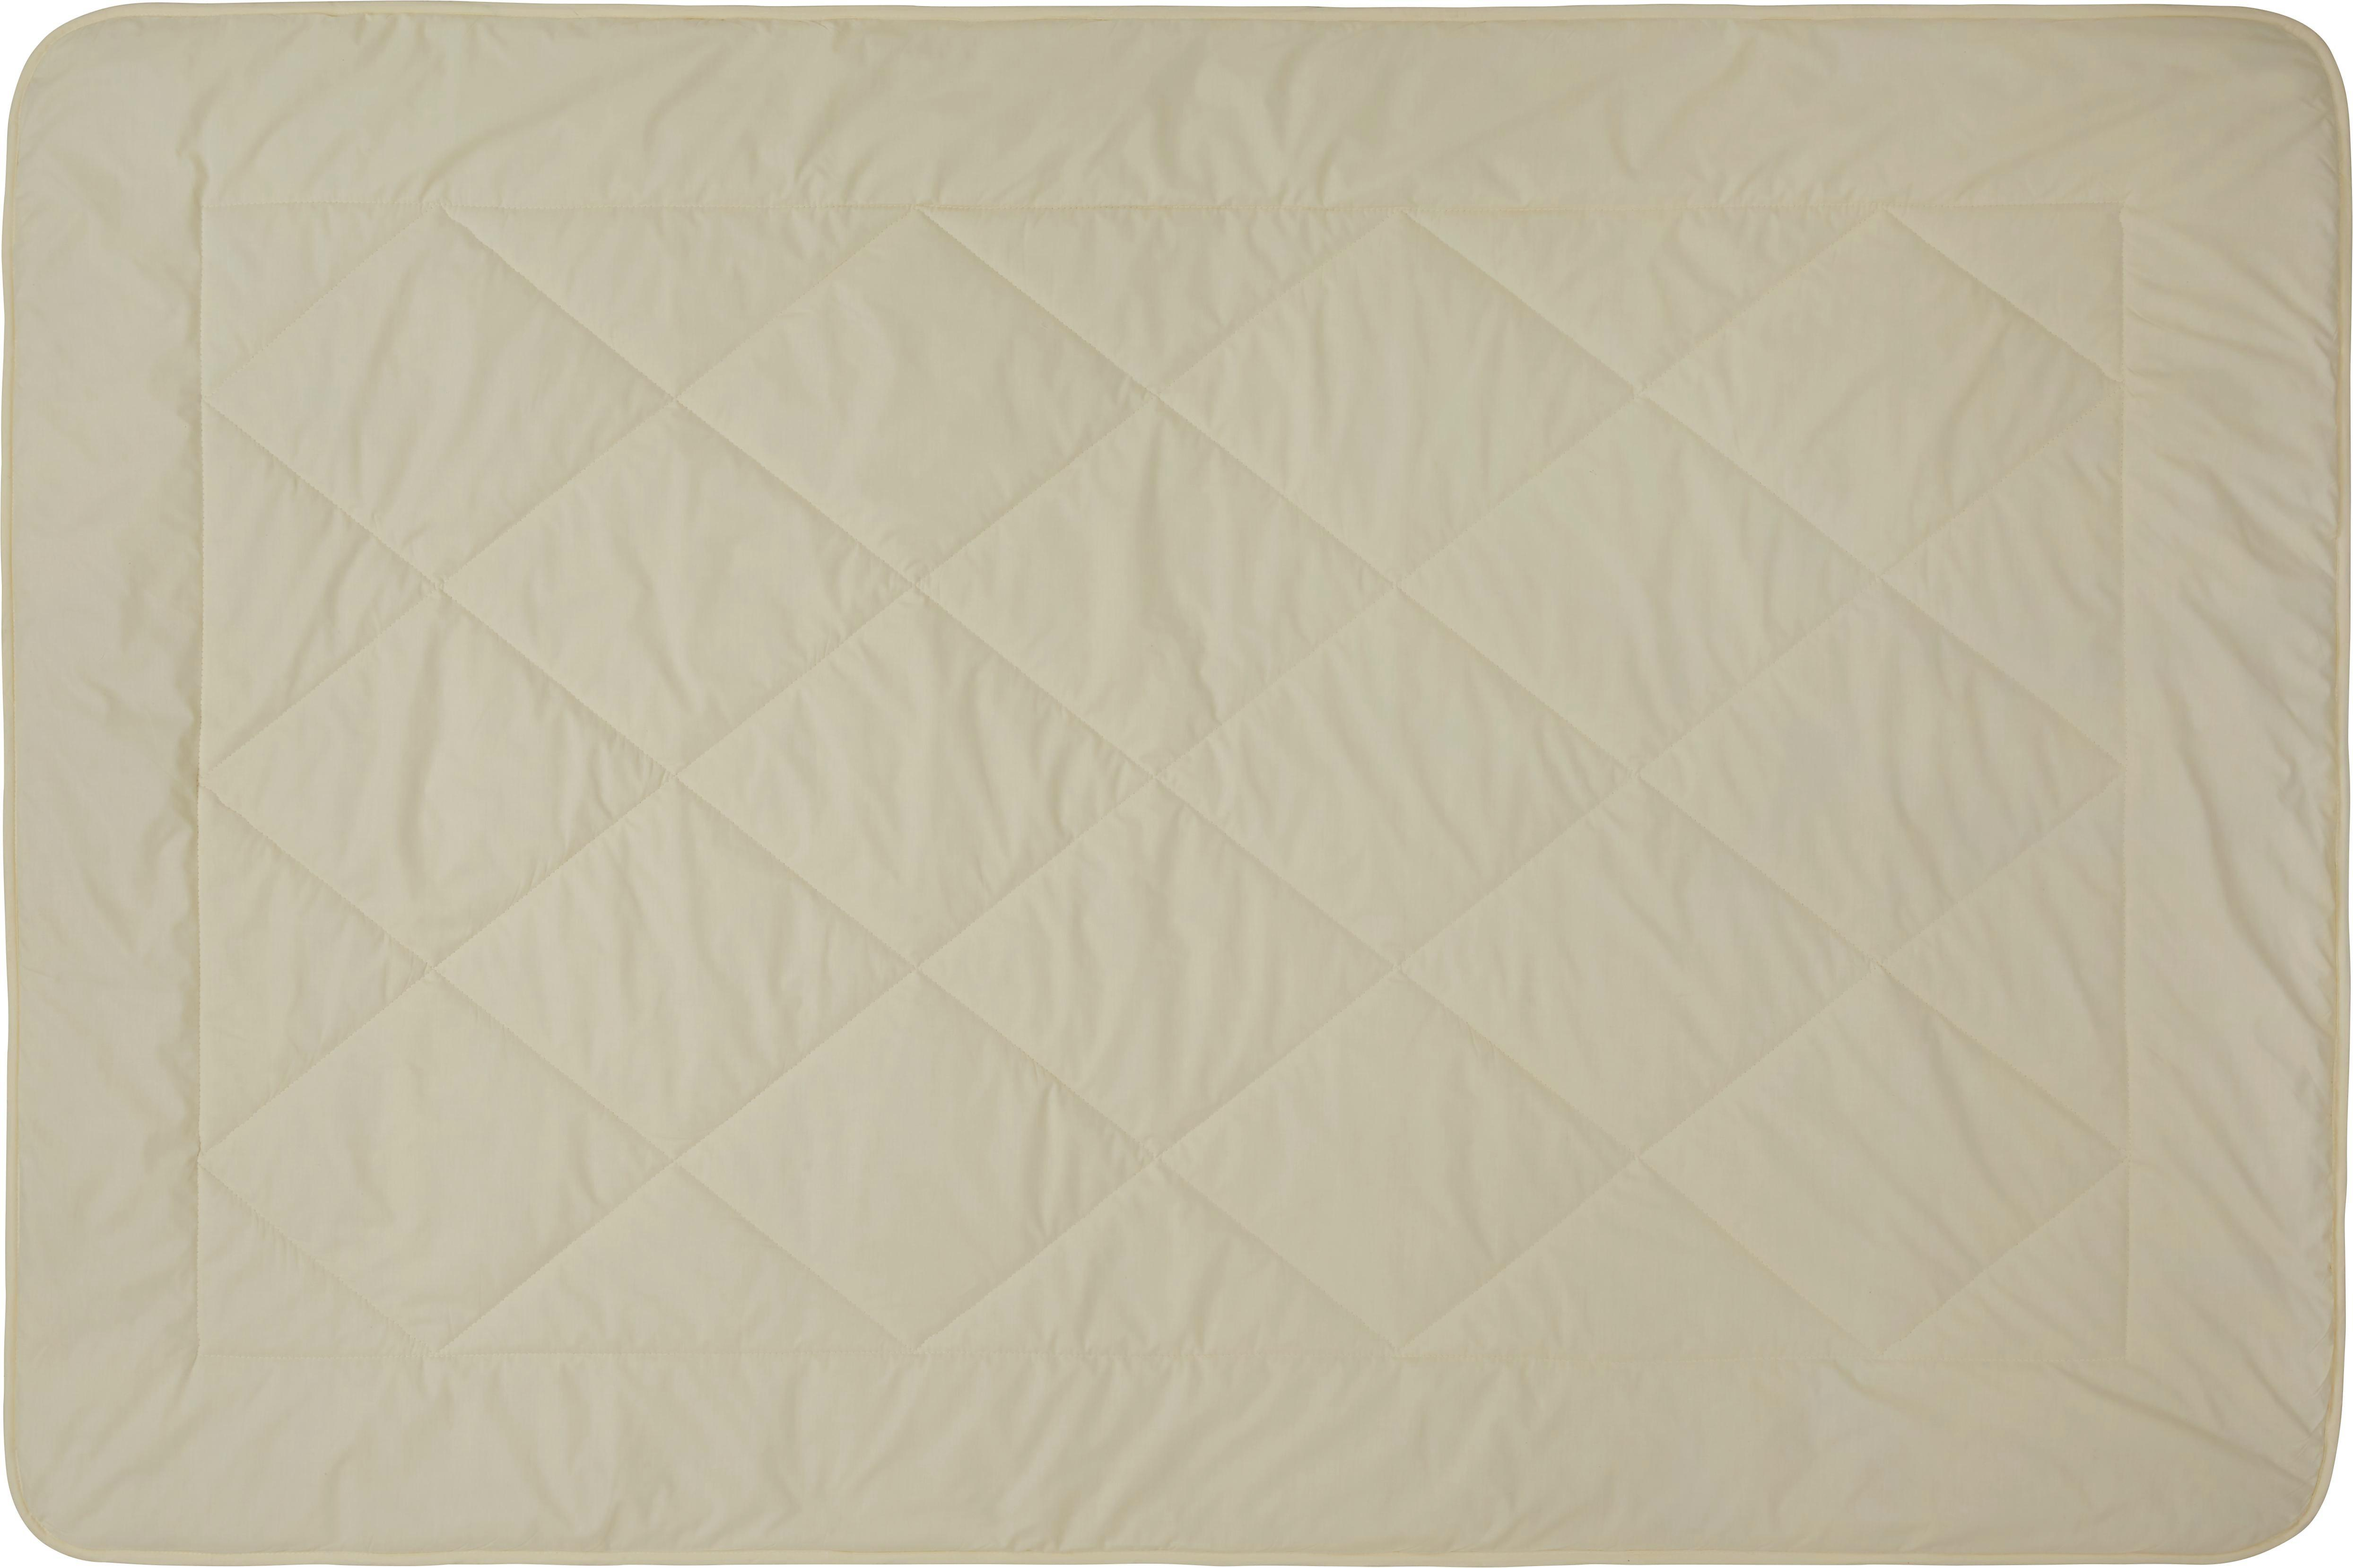 Steppbett Schaffwoll, ca. 135x200cm - Weiß, Textil (135/200cm) - NADANA